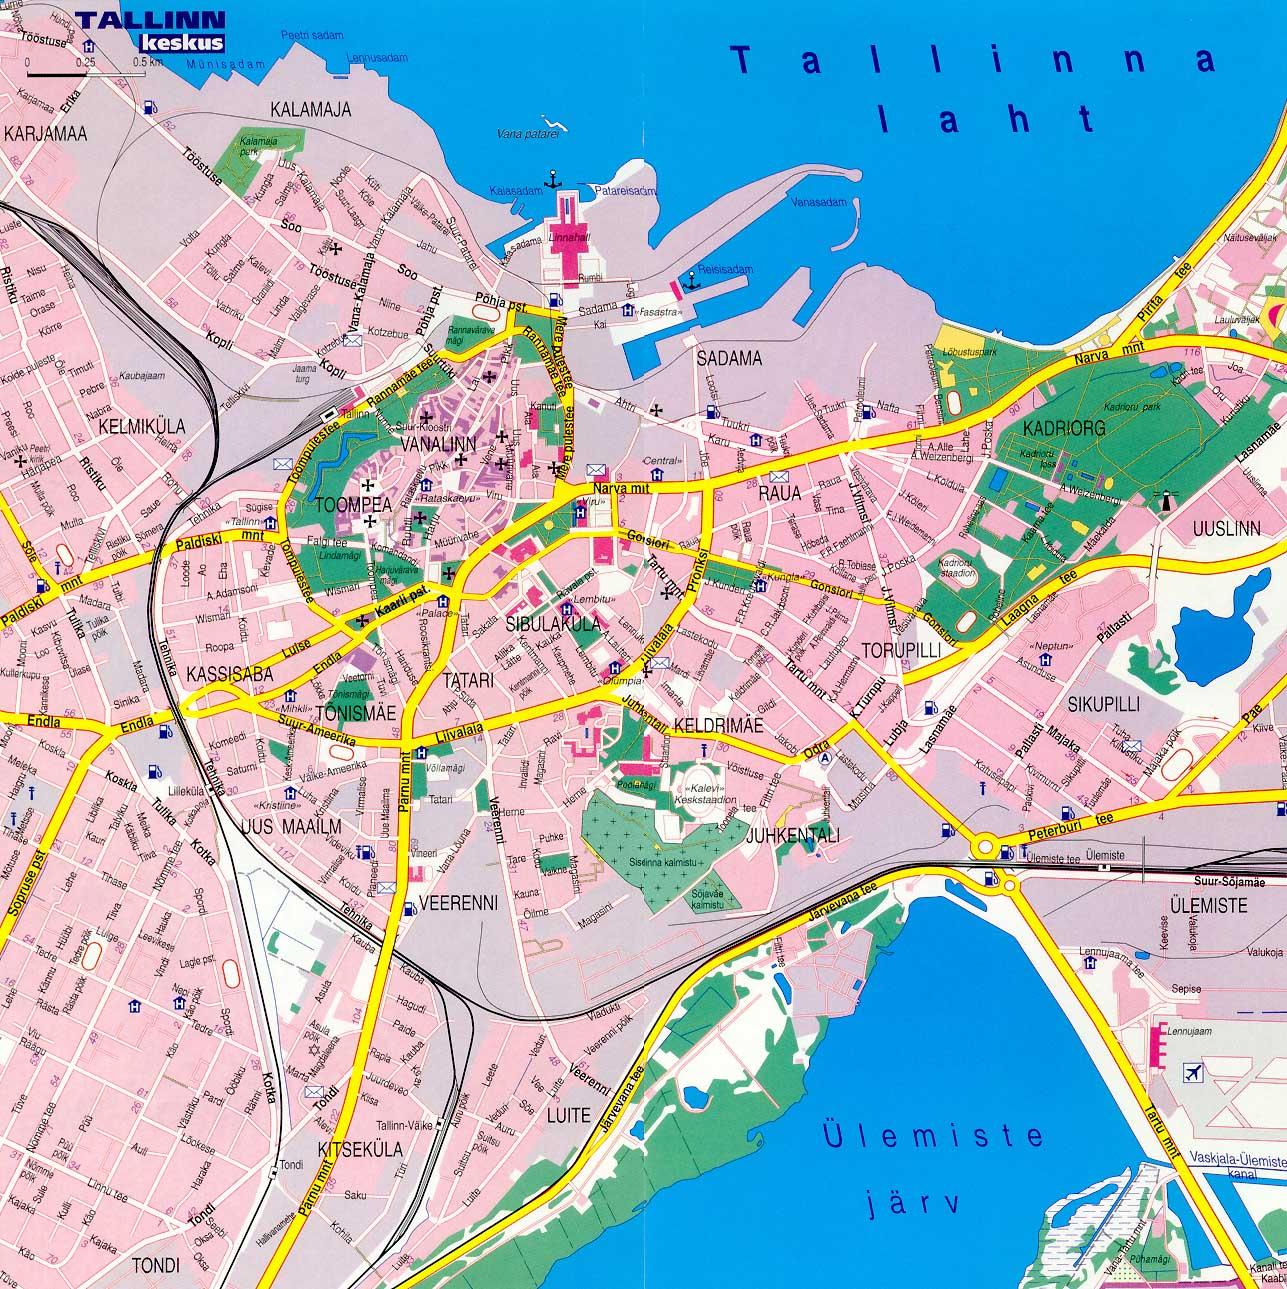 Mapa de Tallinn